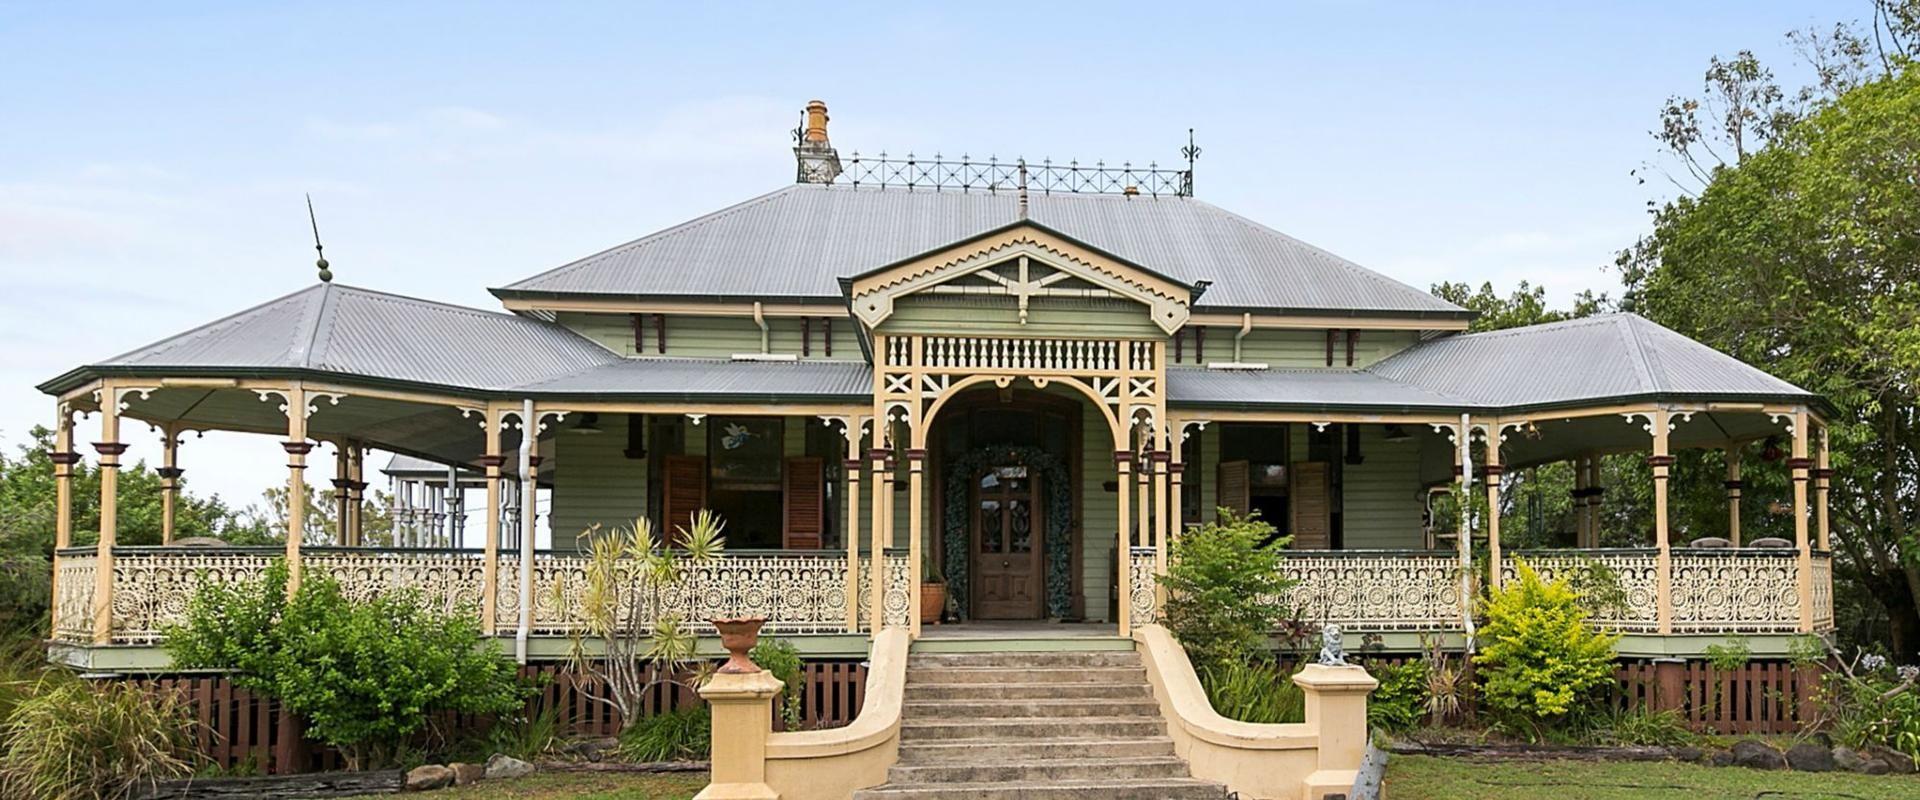 Elamang 6 Watson Street East Ipswich Queensland Built 1895 Queenslander House Australian Homes Colonial House